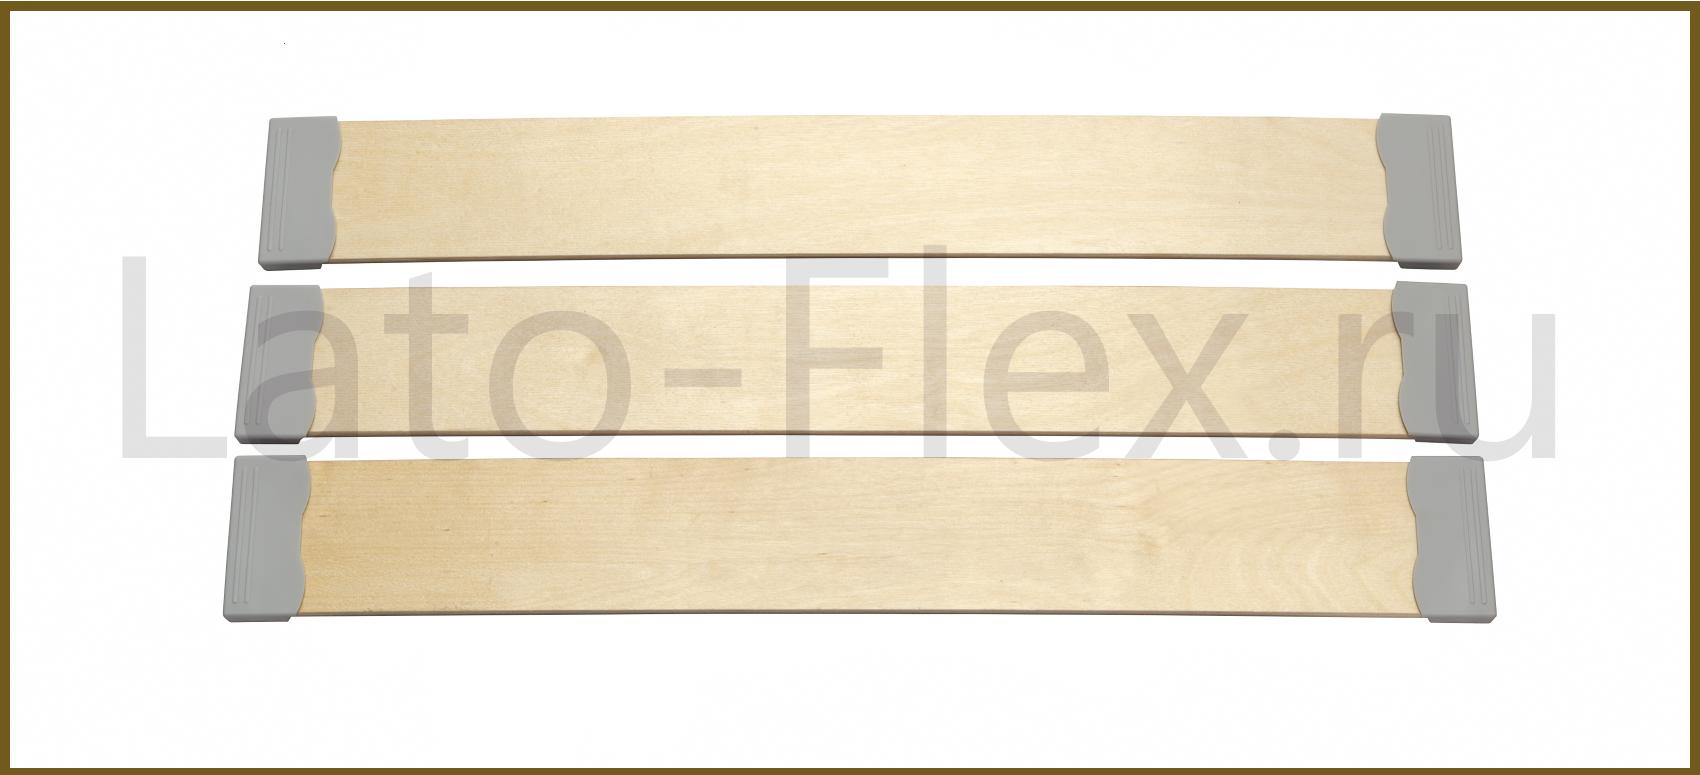 Ламели для кровати широкие 83*8*590-1325 мм | Часто используютя в диванах